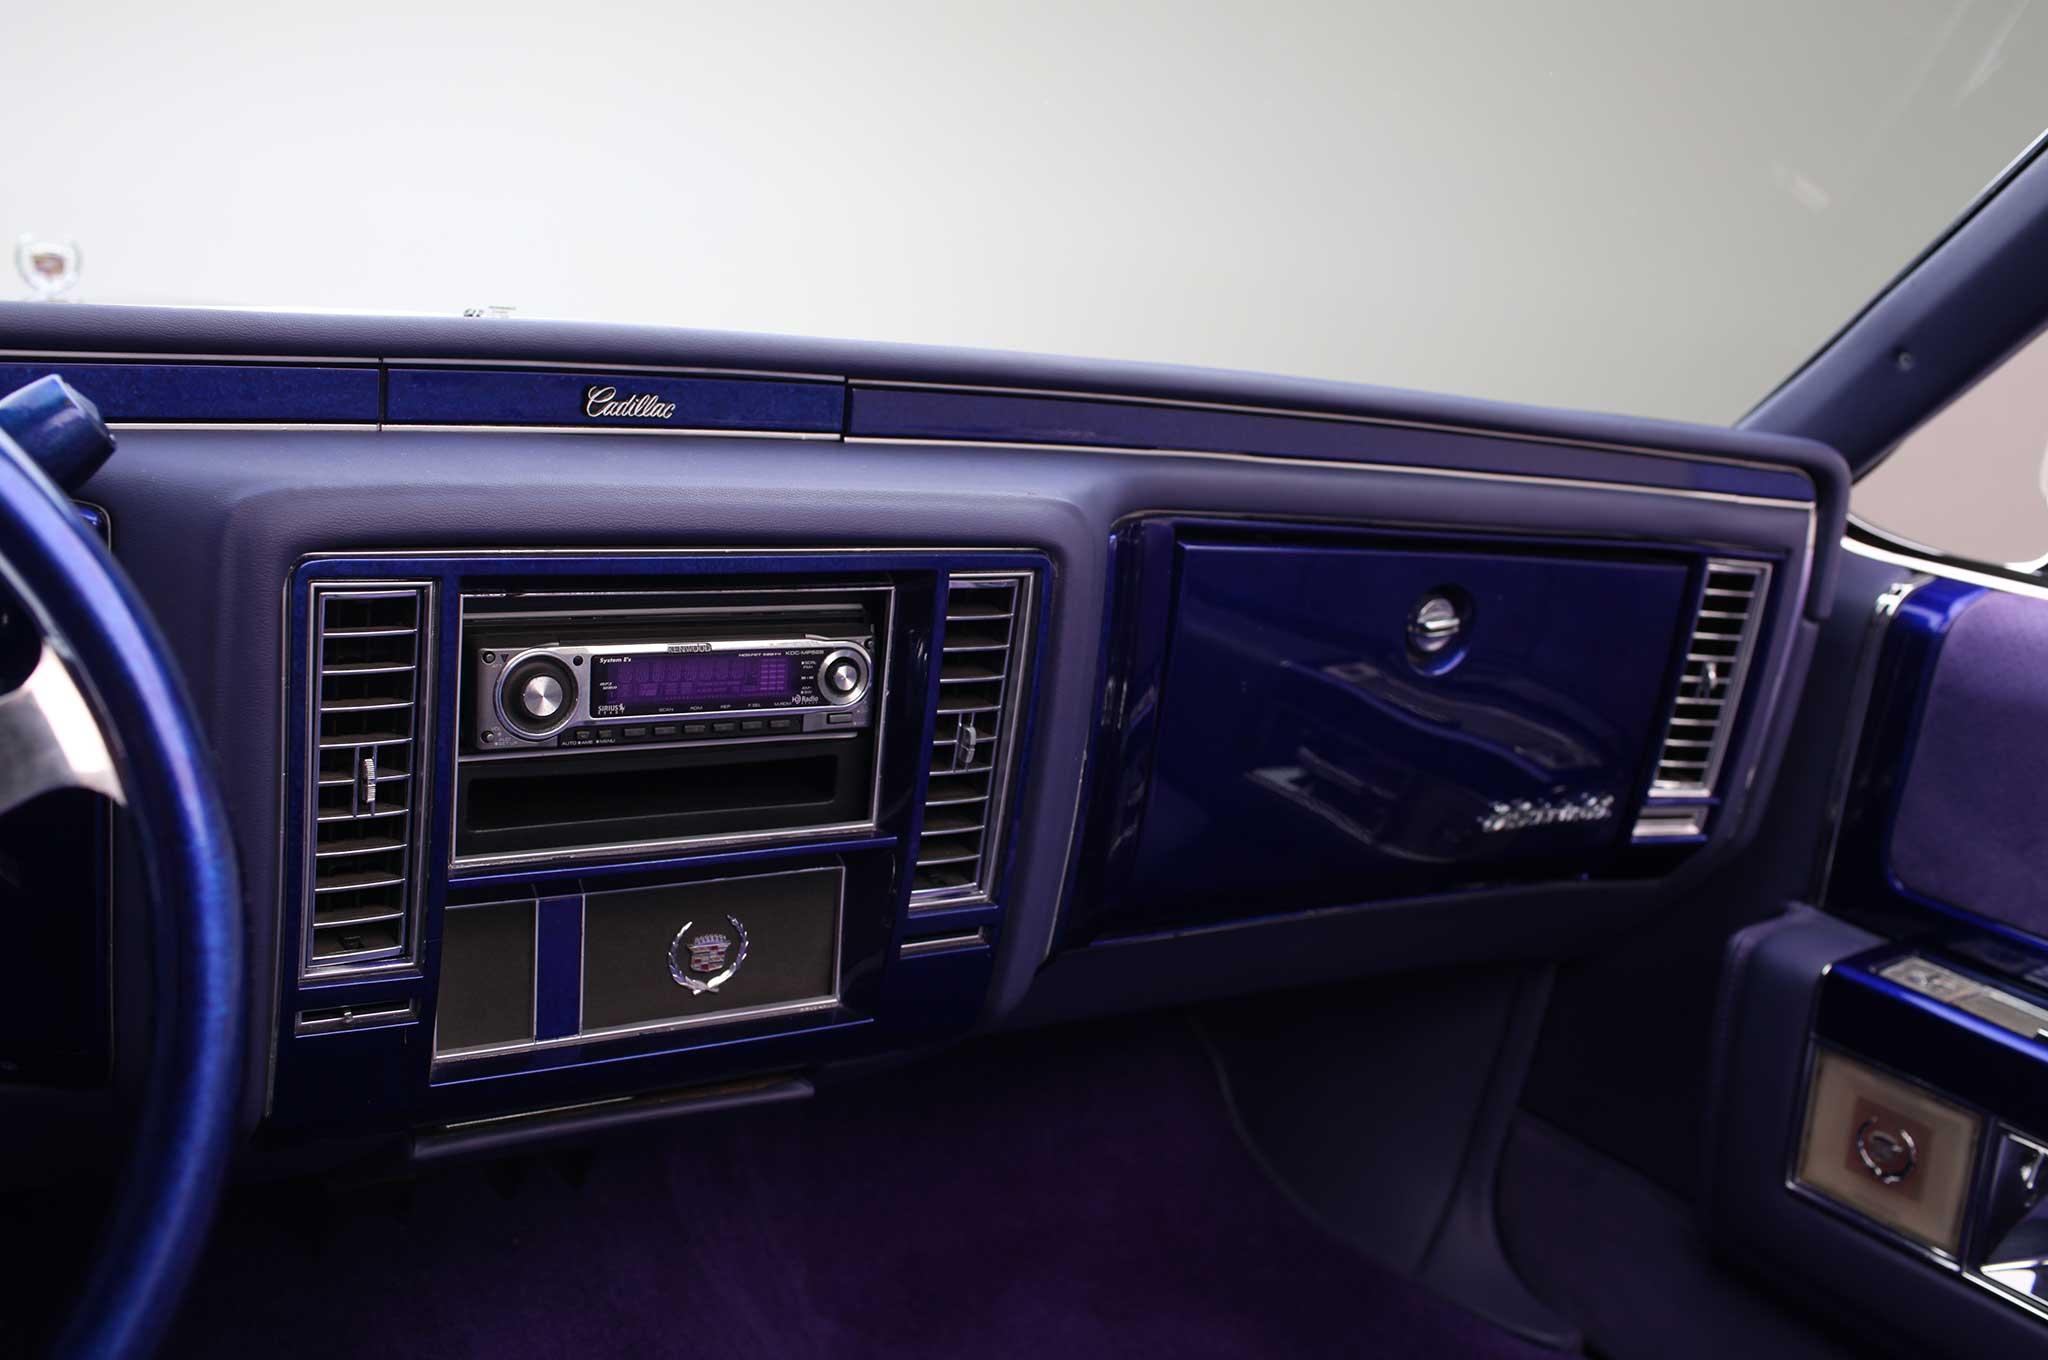 15 Inch Tires >> 1979 Cadillac Le Cabriolet - Purple Rein - Lowrider